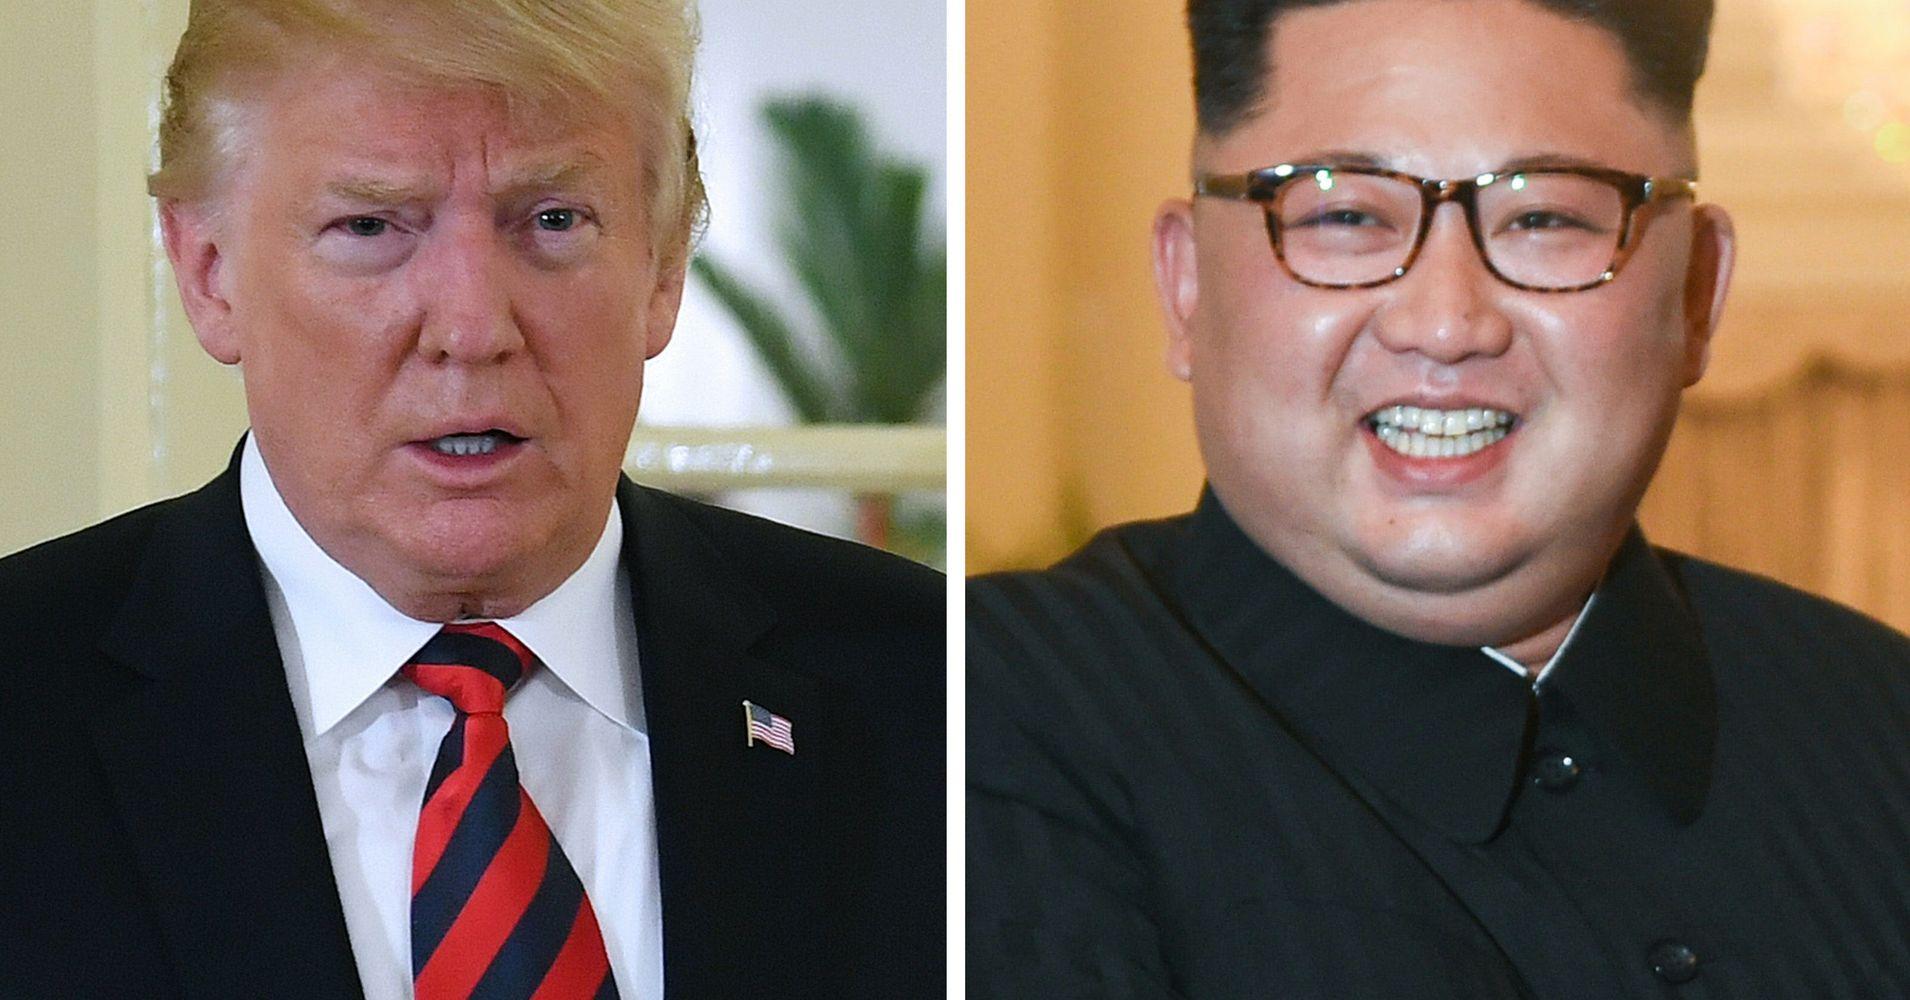 Murderous Dictator Meets Dishonest President Behind Closed Doors